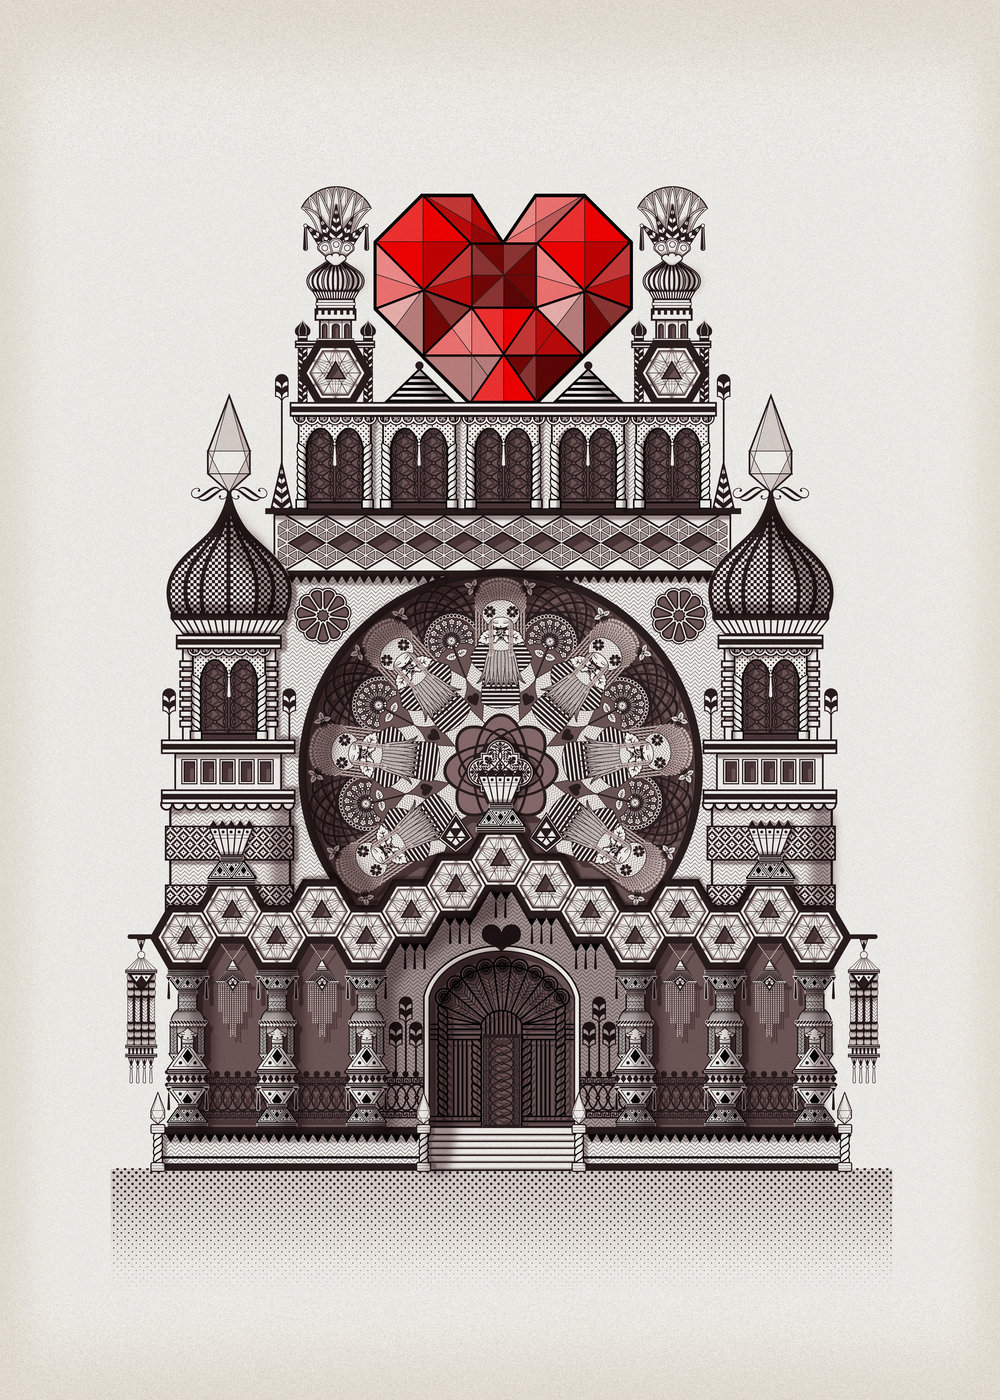 Empirical temple of love  - Digital illustration   2014